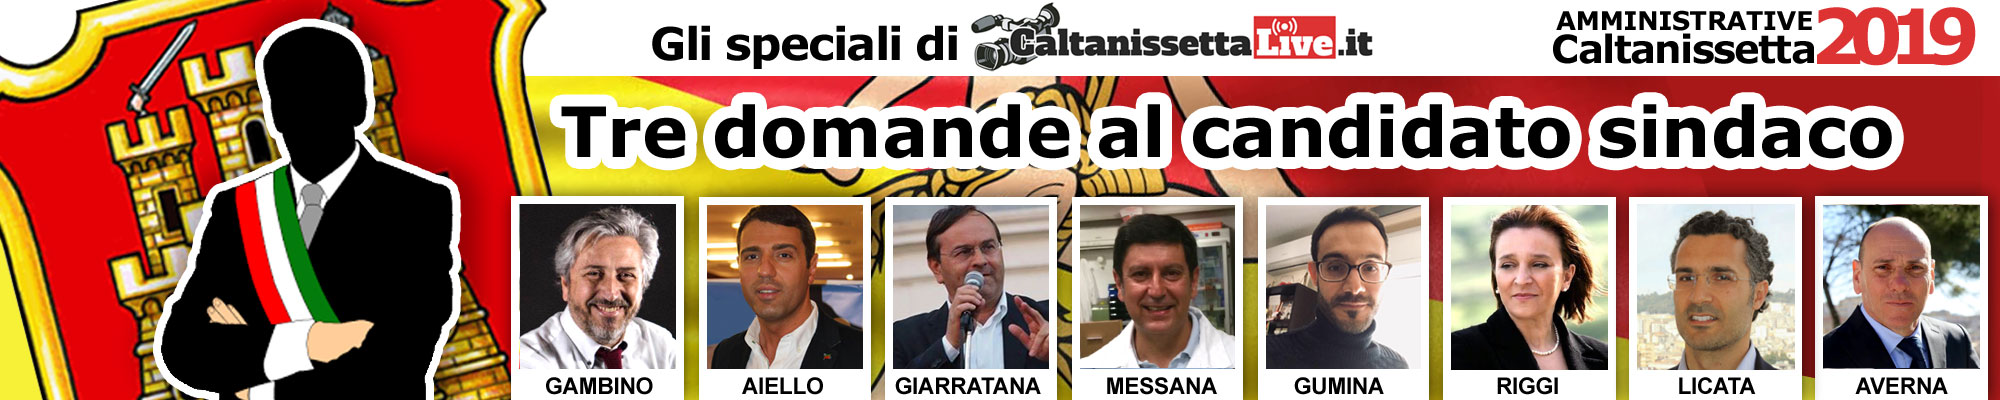 speciale caltanissetta amministrative 2019